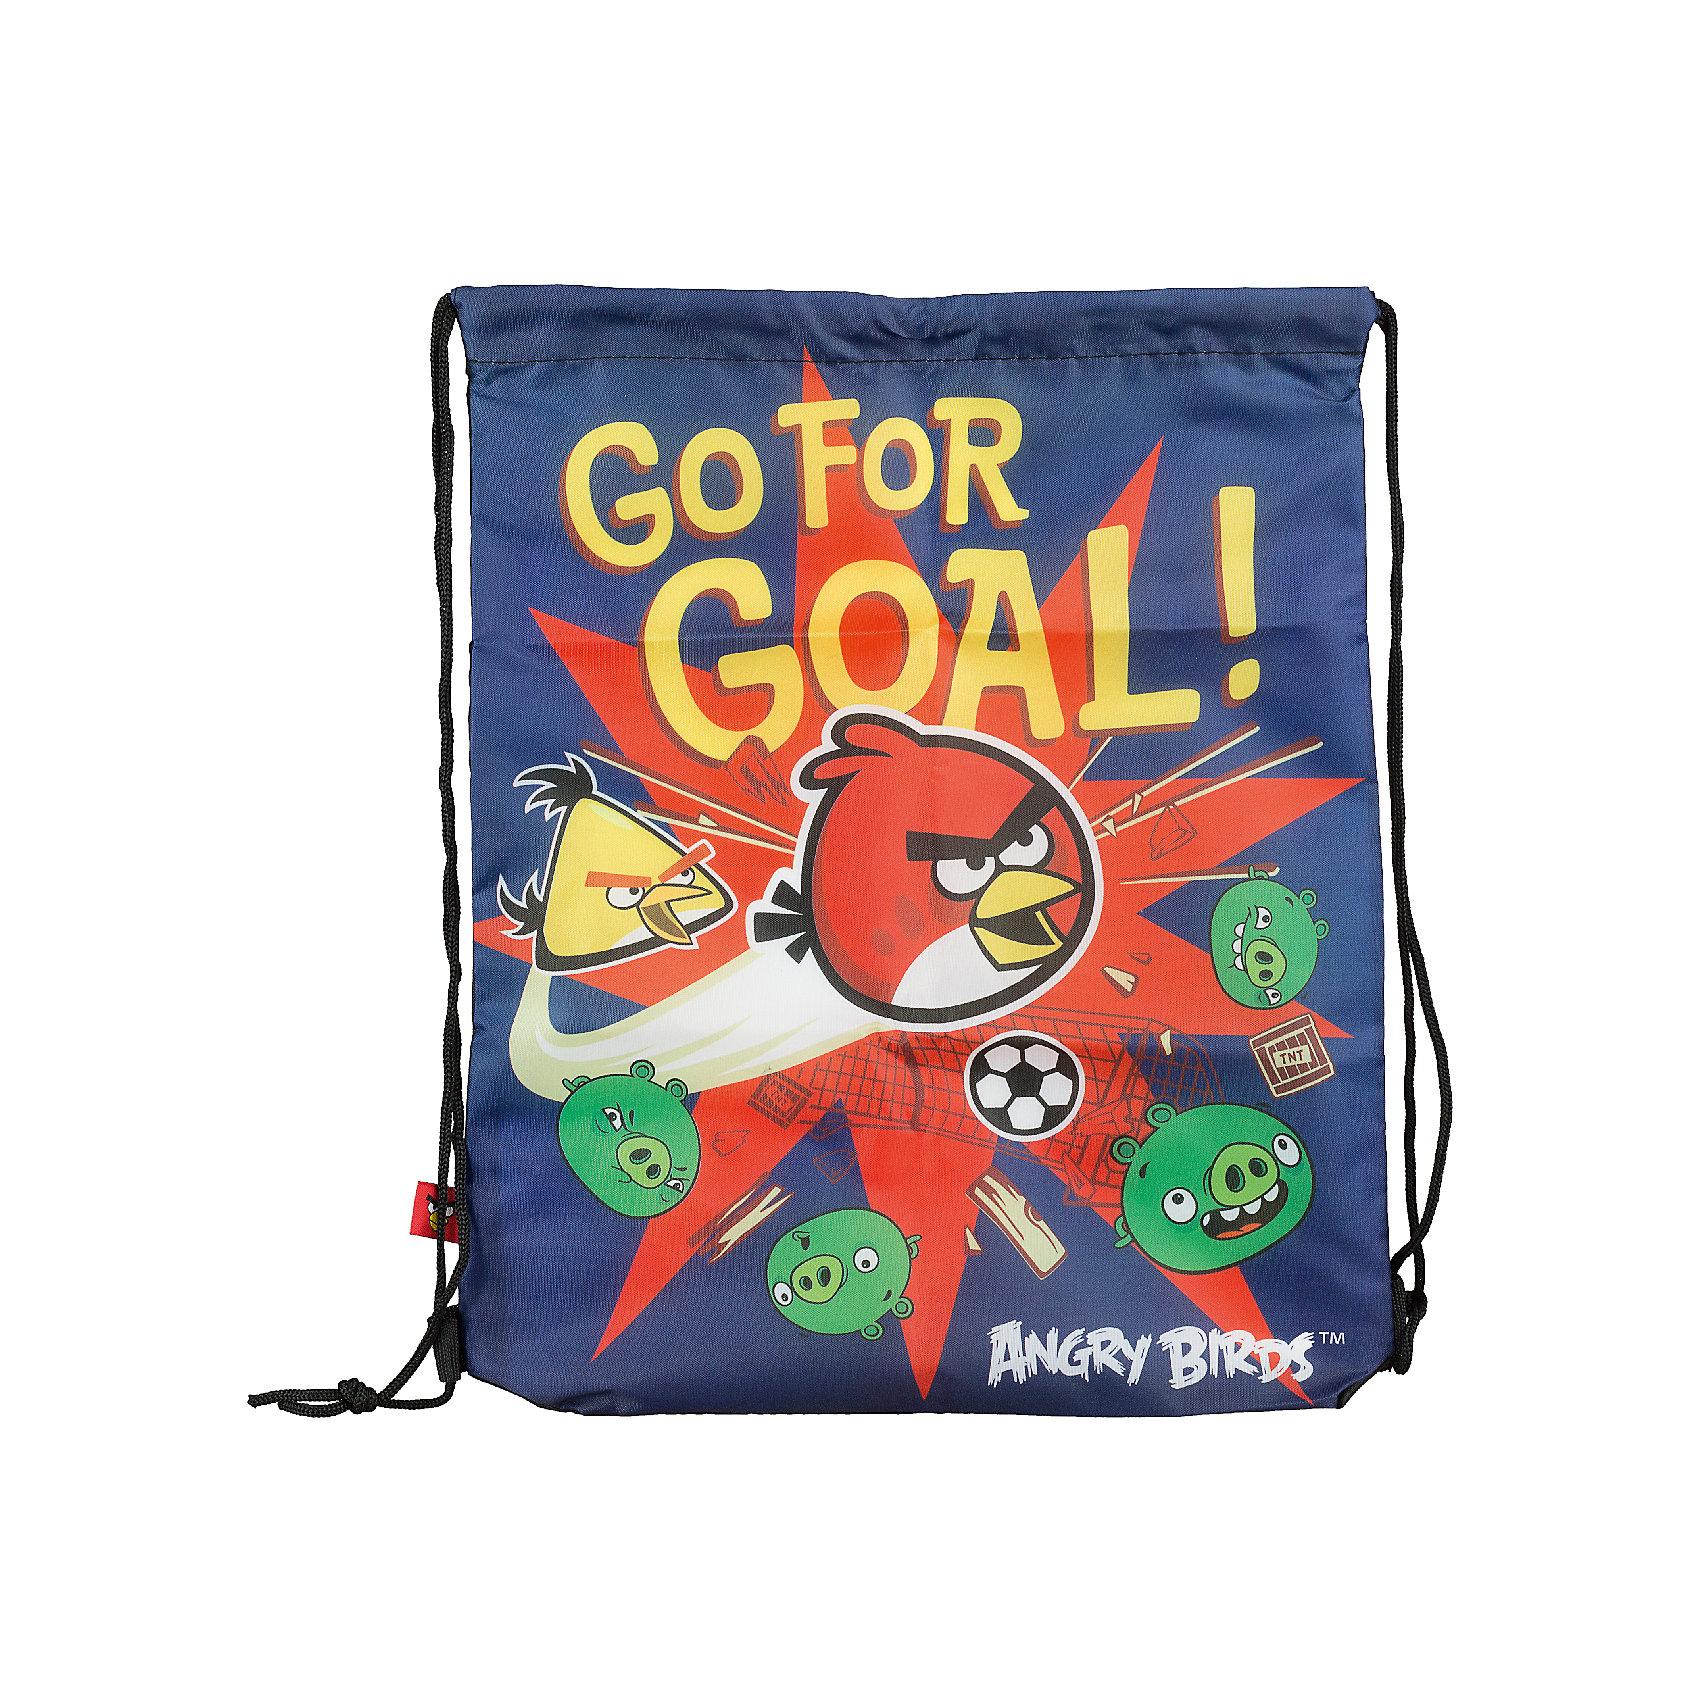 Академия групп Сумка-рюкзак для обуви Angry Birds академия групп сумка рюкзак для обуви angry birds